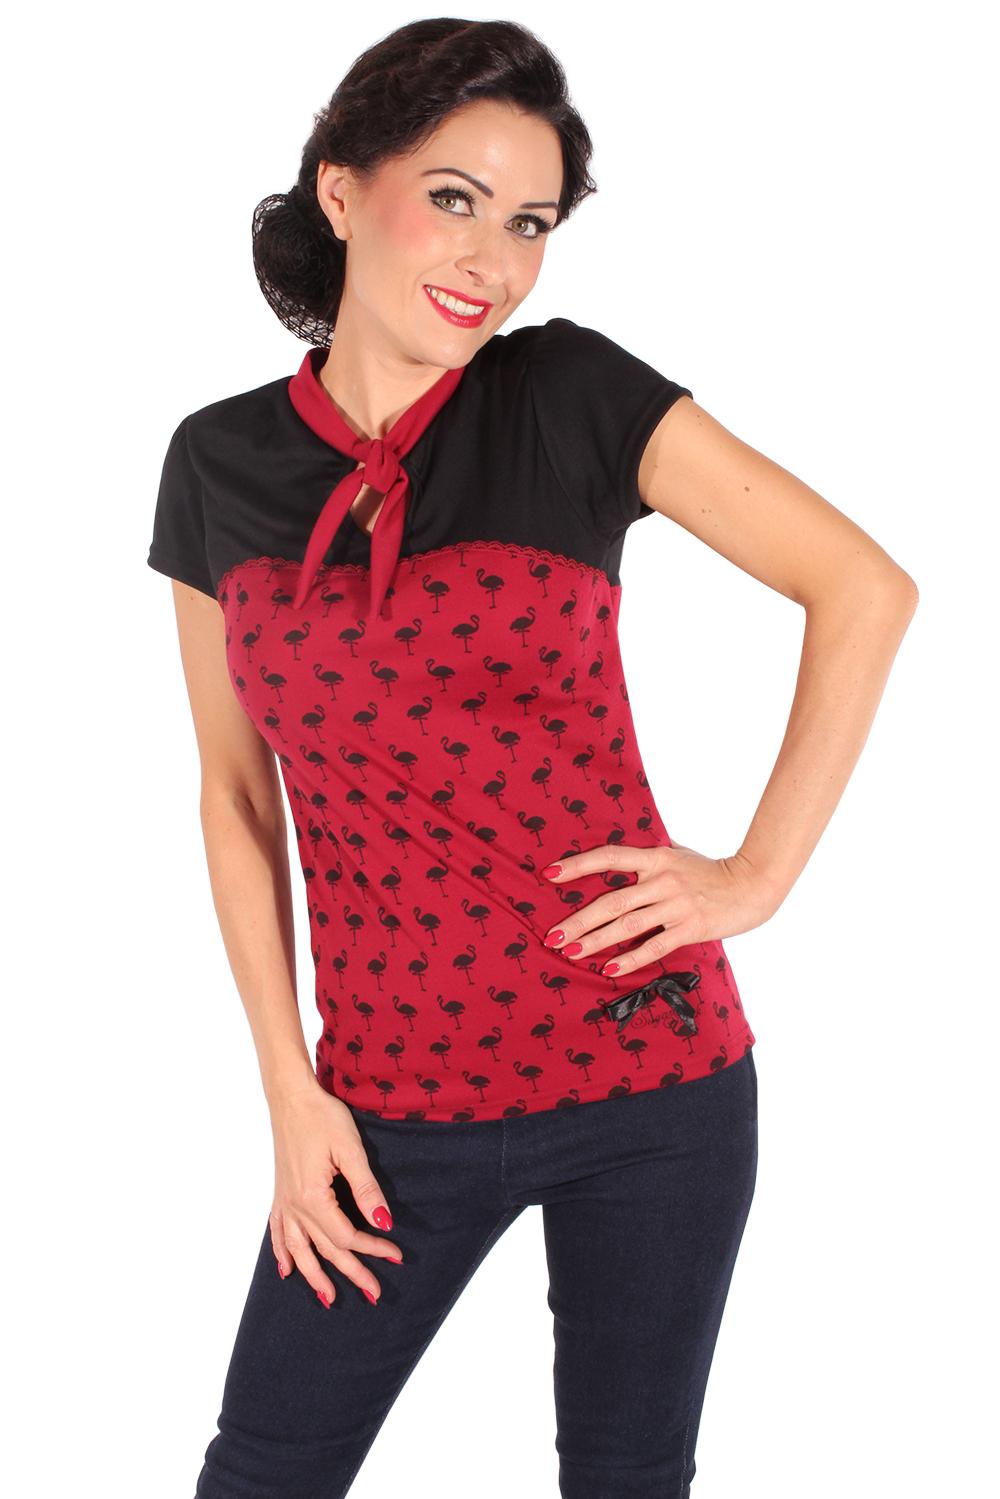 Retro Flamingo Rockabilly Schlüsselloch Puffärmel Corsagen Optik T-Shirt